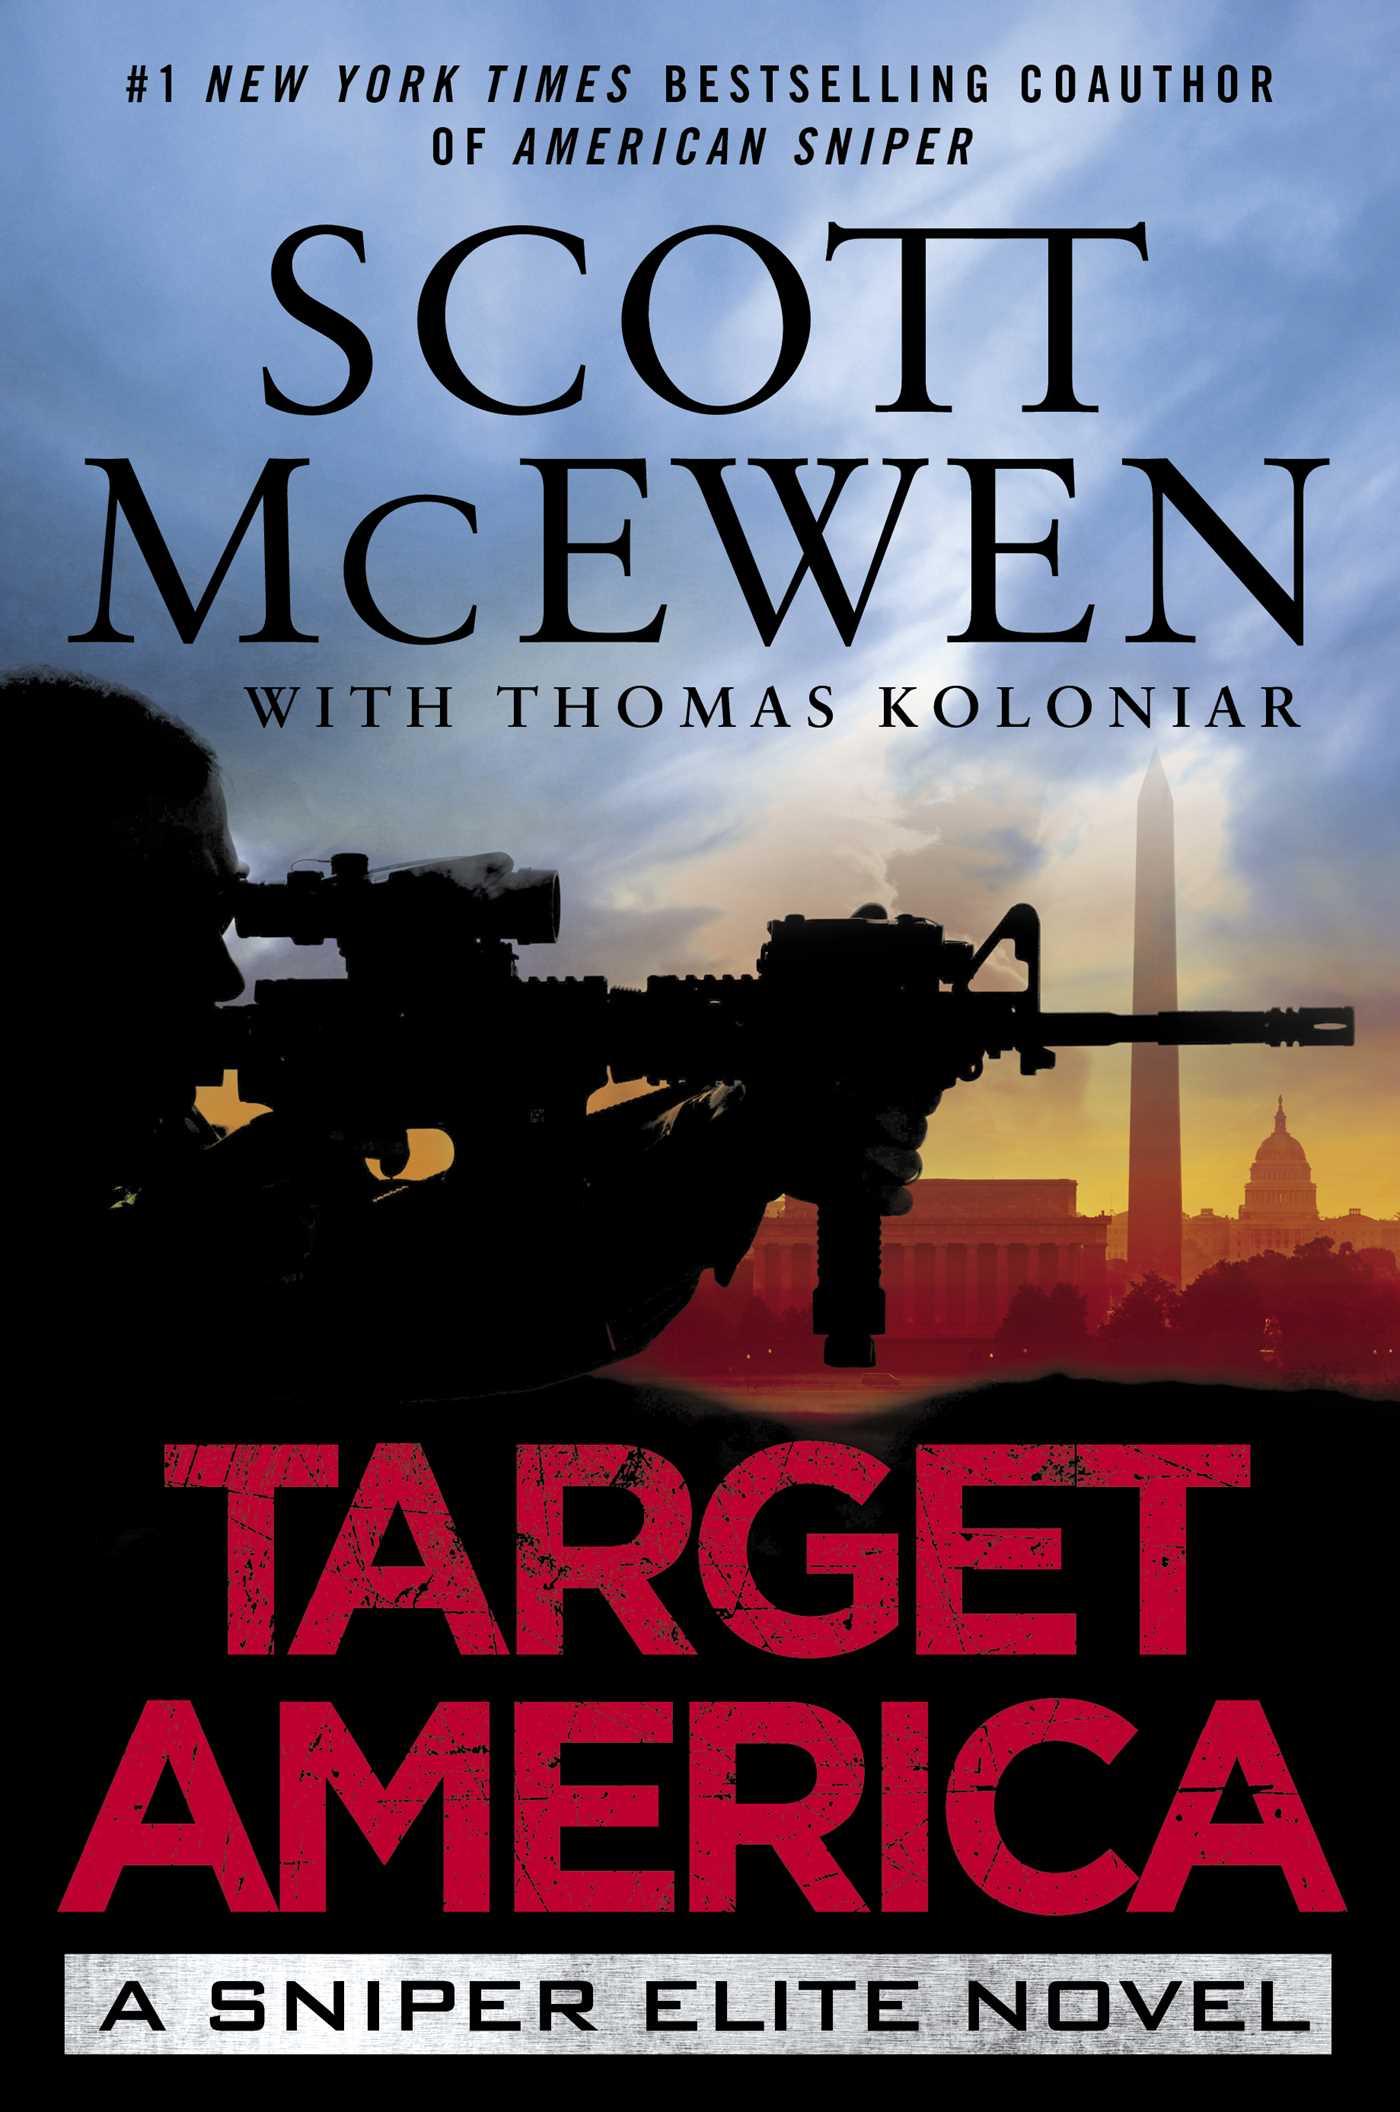 Target america a sniper elite novel ebook array target america ebook by scott mcewen thomas koloniar official rh simonandschuster com fandeluxe Images